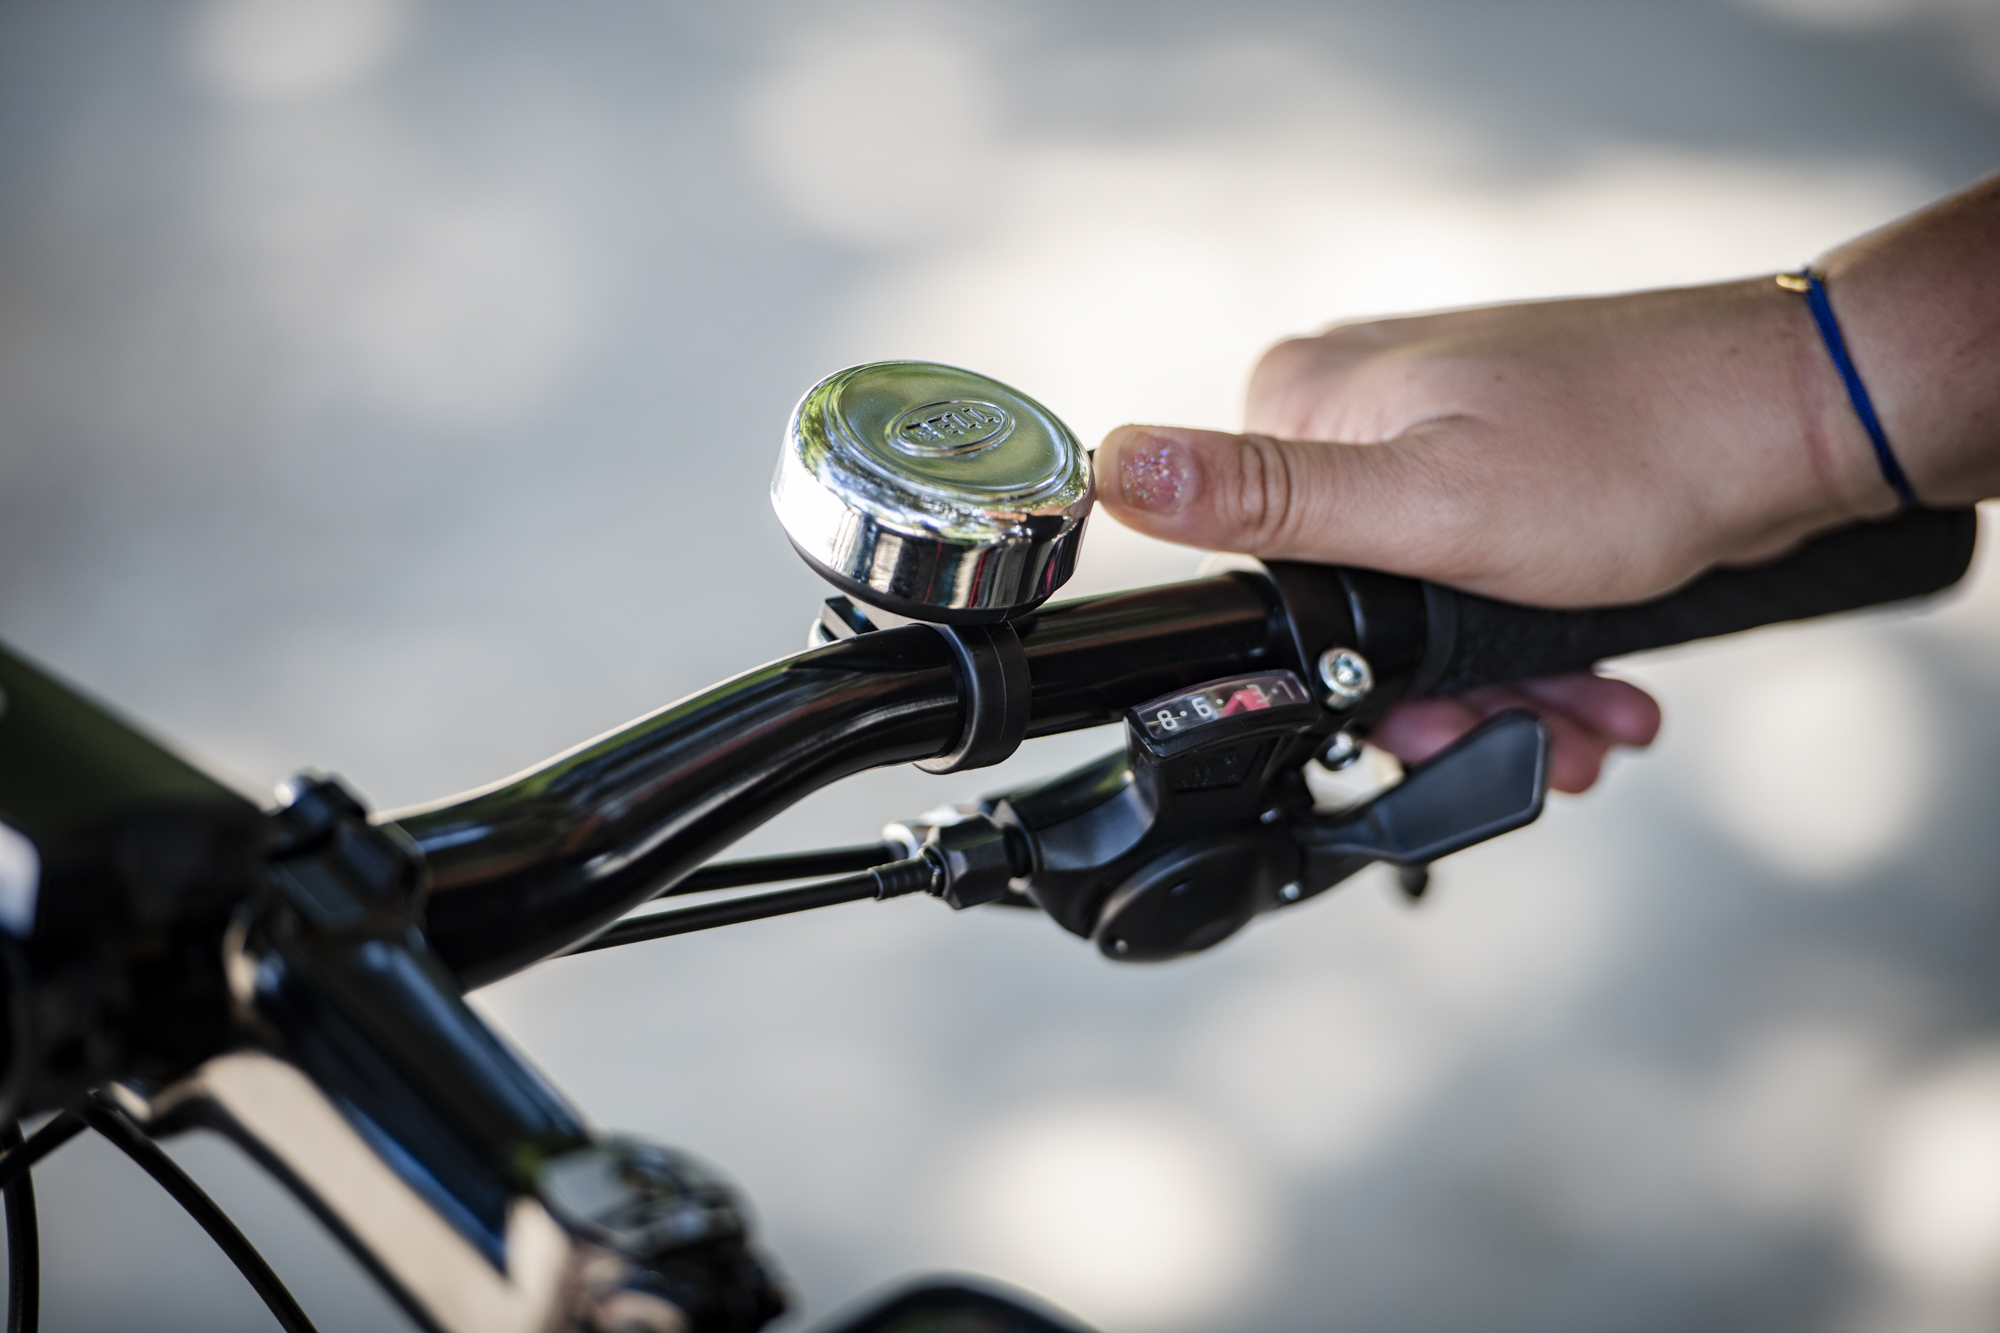 Children/'s Bike Bells CHRISTMAS GIFT RETRO ROUND JUNIOR KIDS BIKE DING DONG BELL